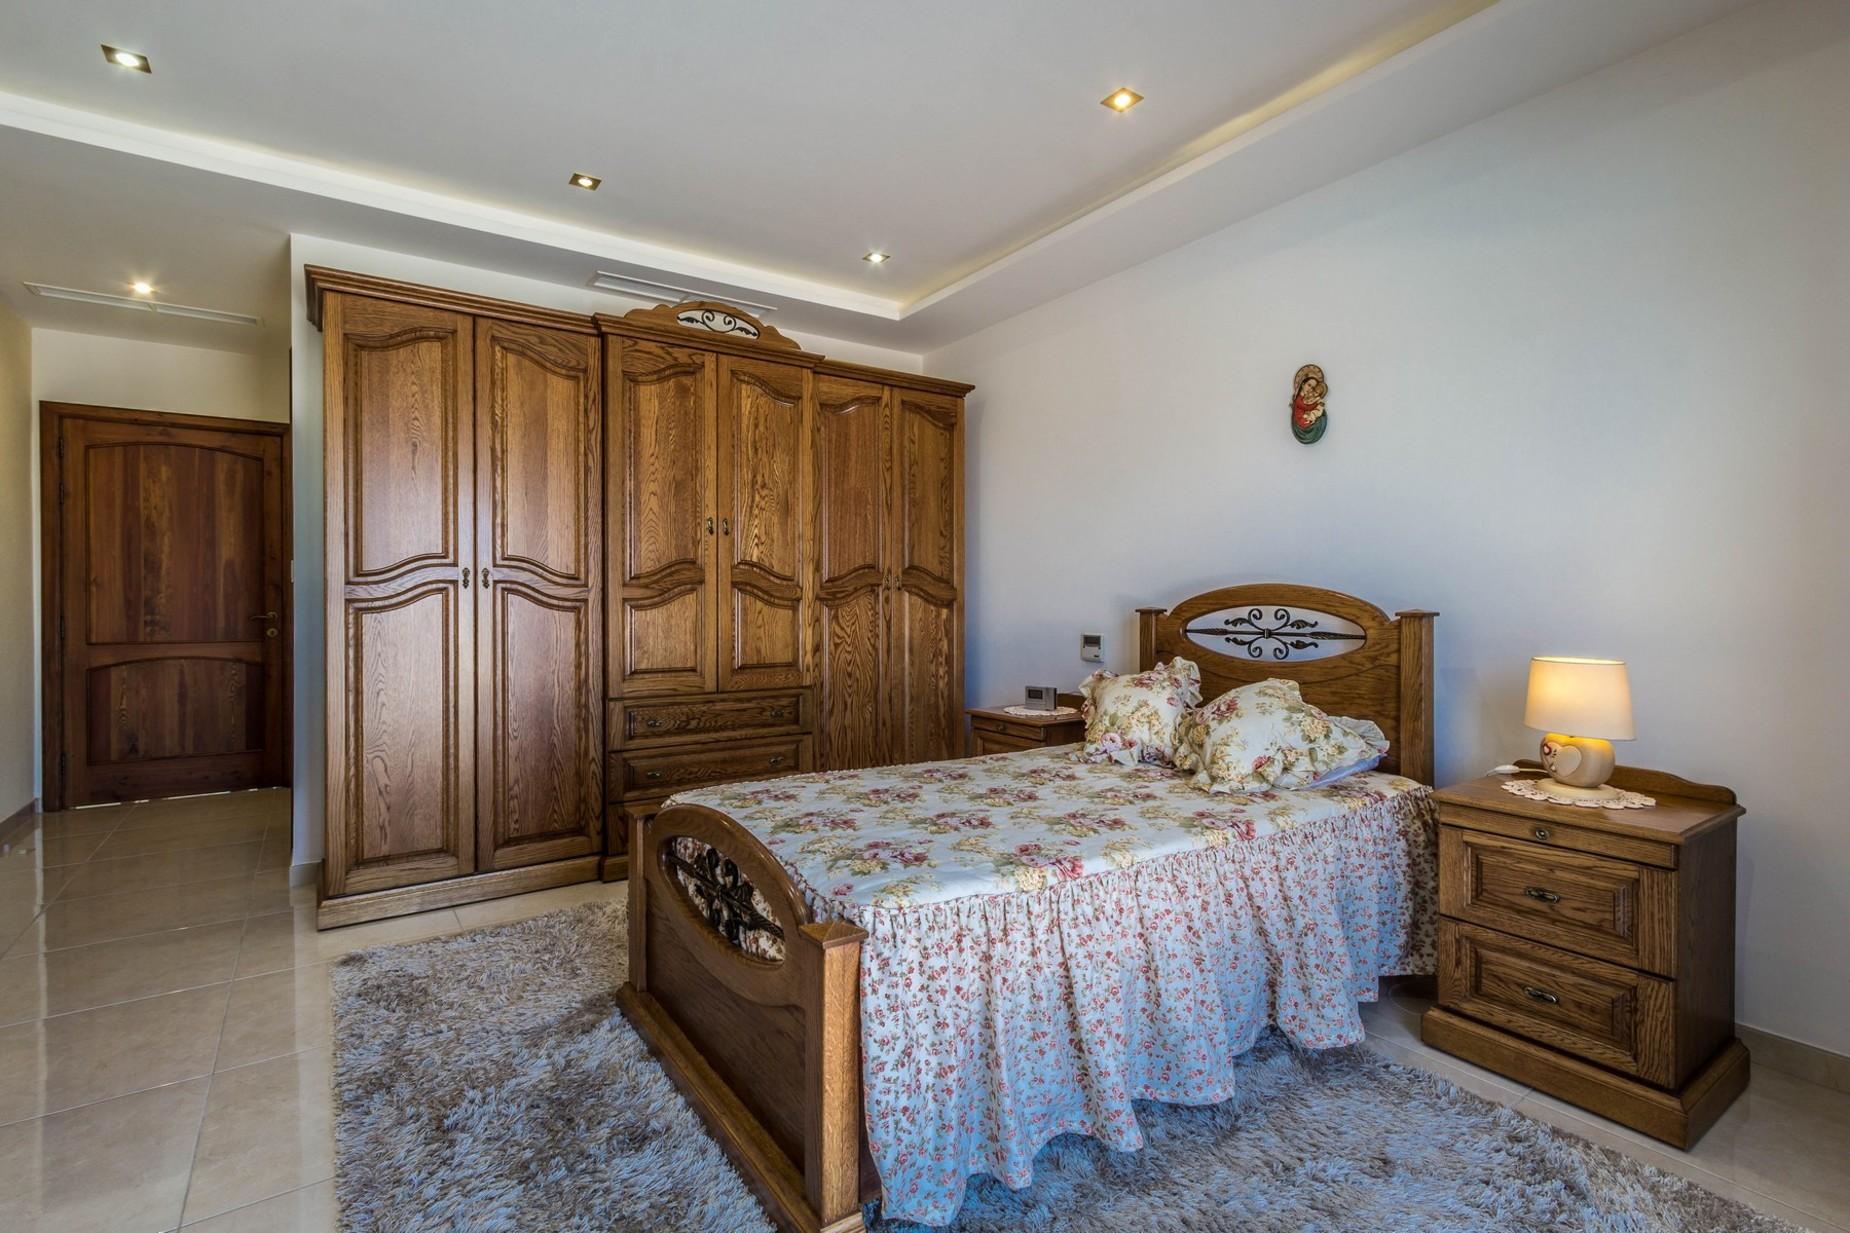 4 bed Villa For Sale in Naxxar, Naxxar - thumb 10